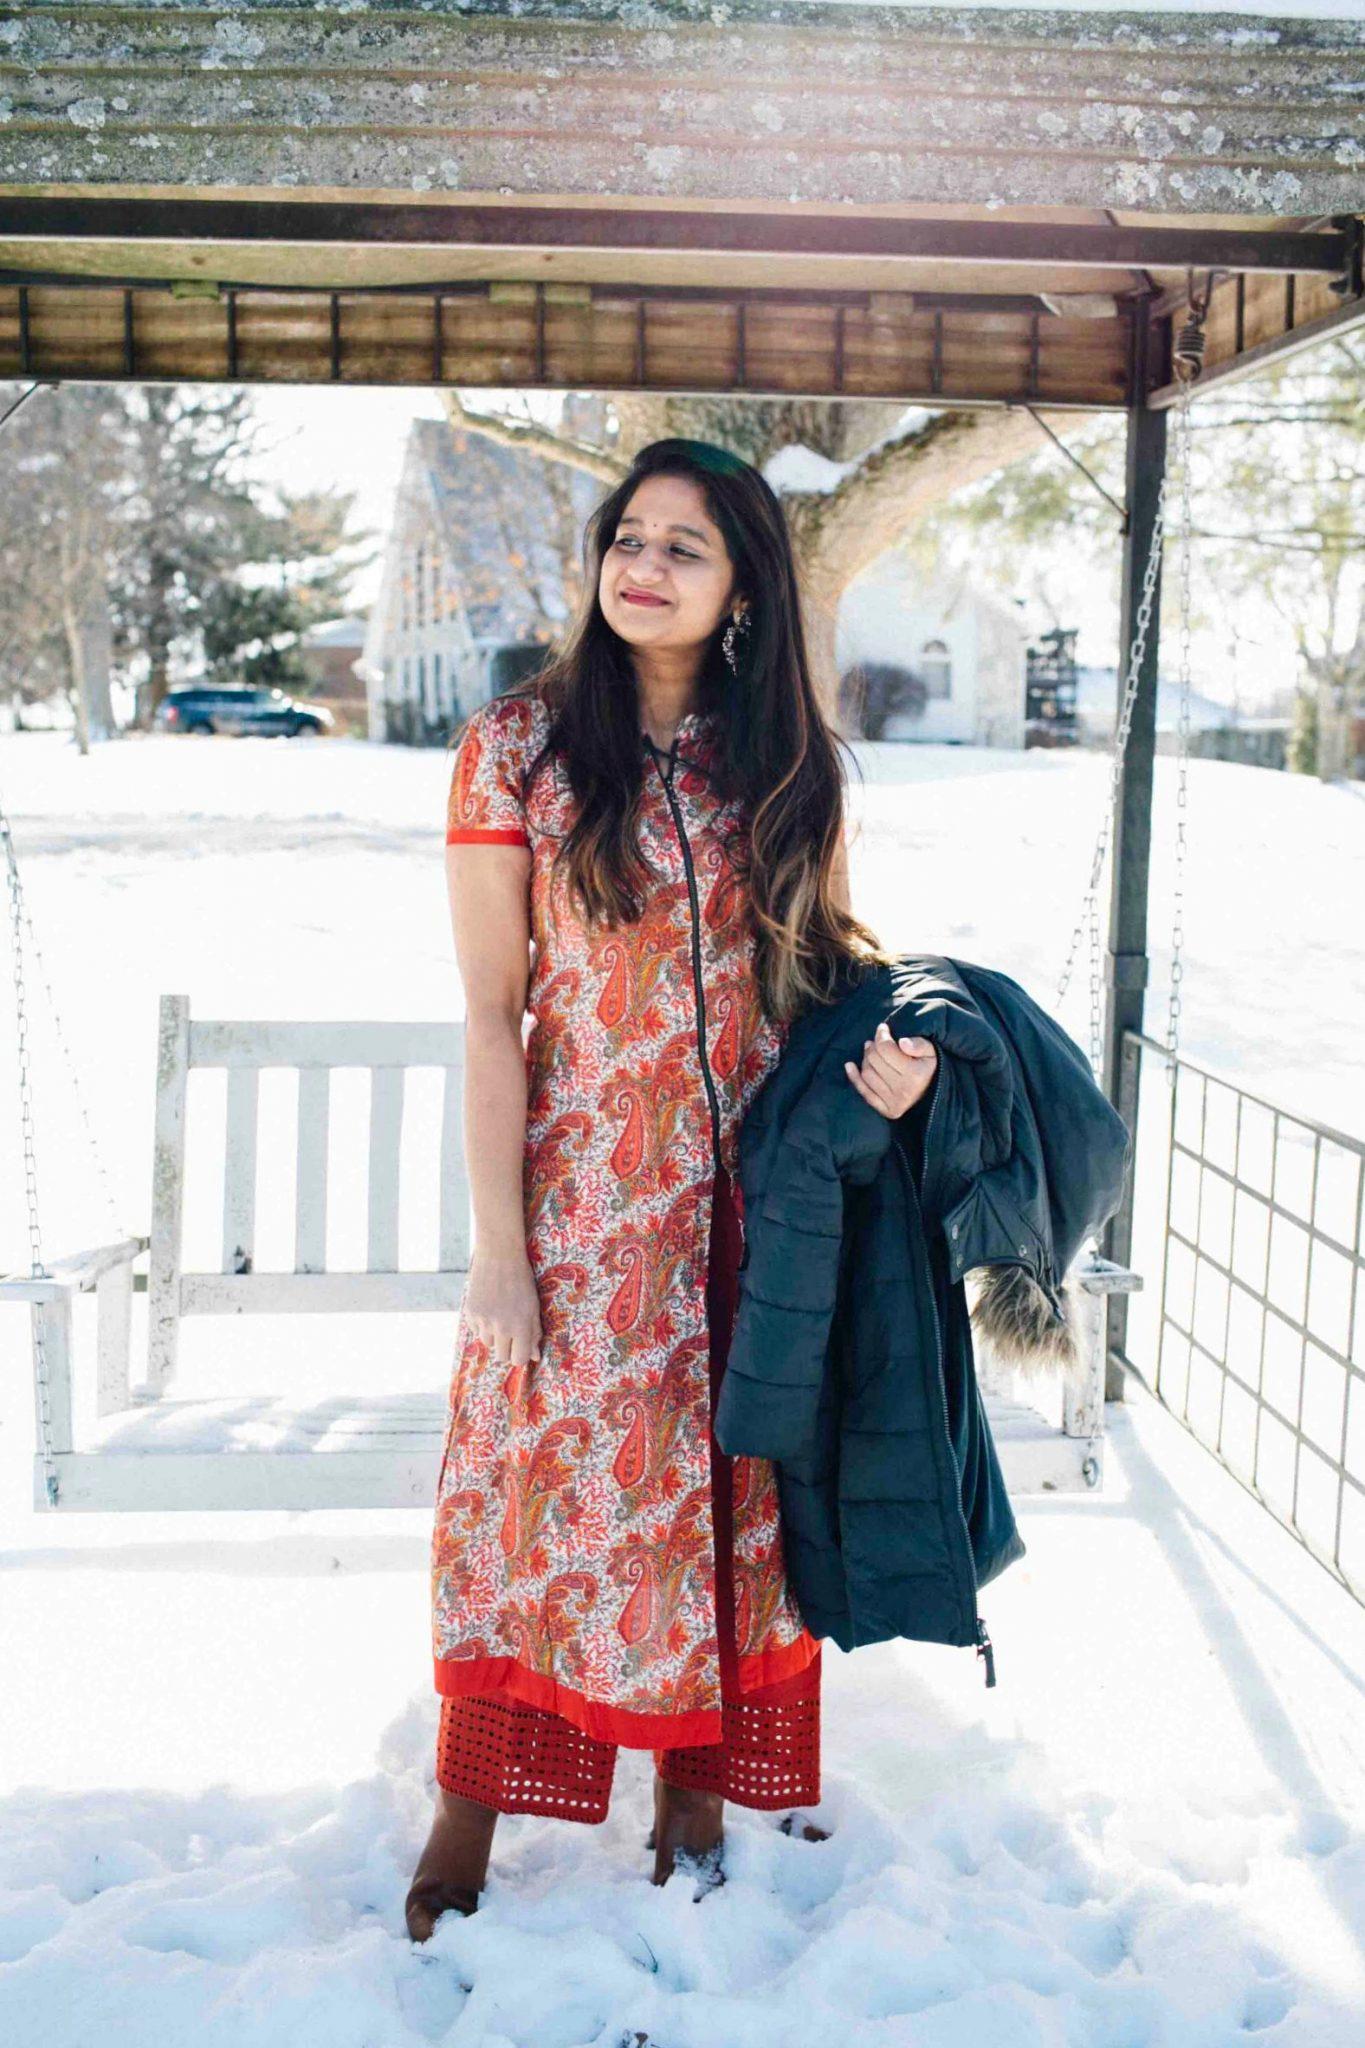 lifestyle blog dreaming loud sharing Makar Sankranti or pongal Outfit 1